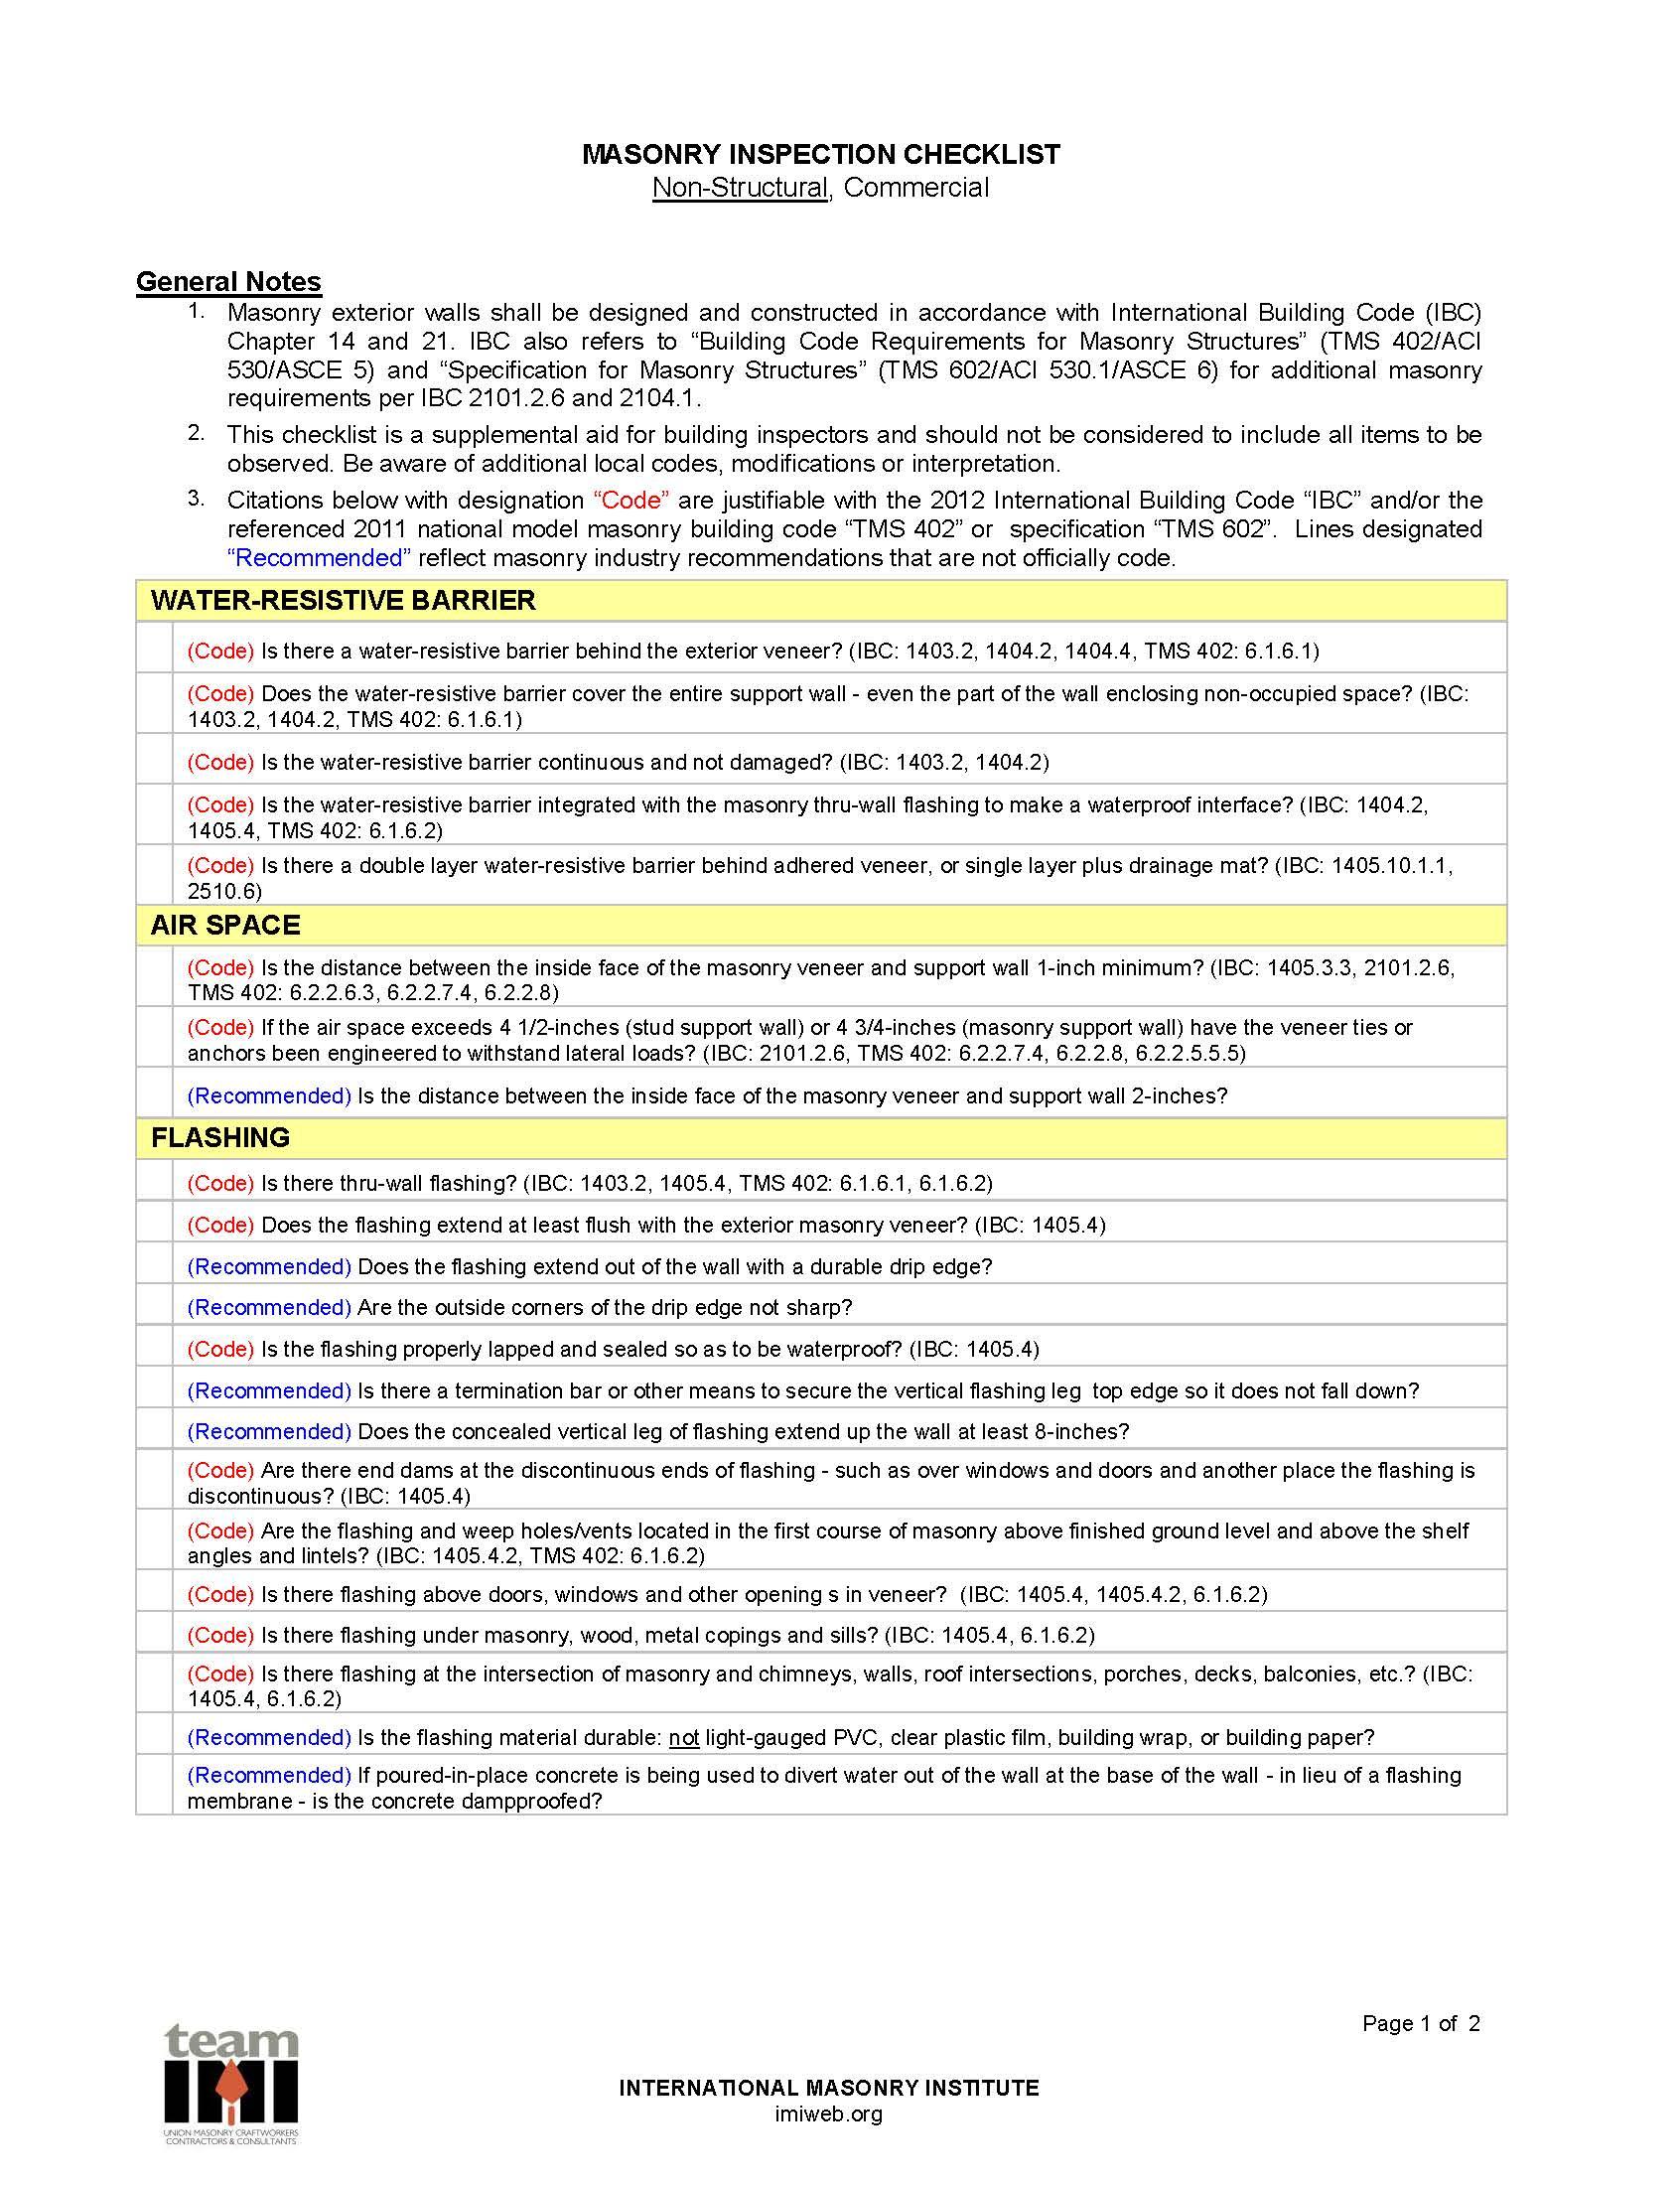 IMI Masonry Inspection Checklist_Page_1.jpg